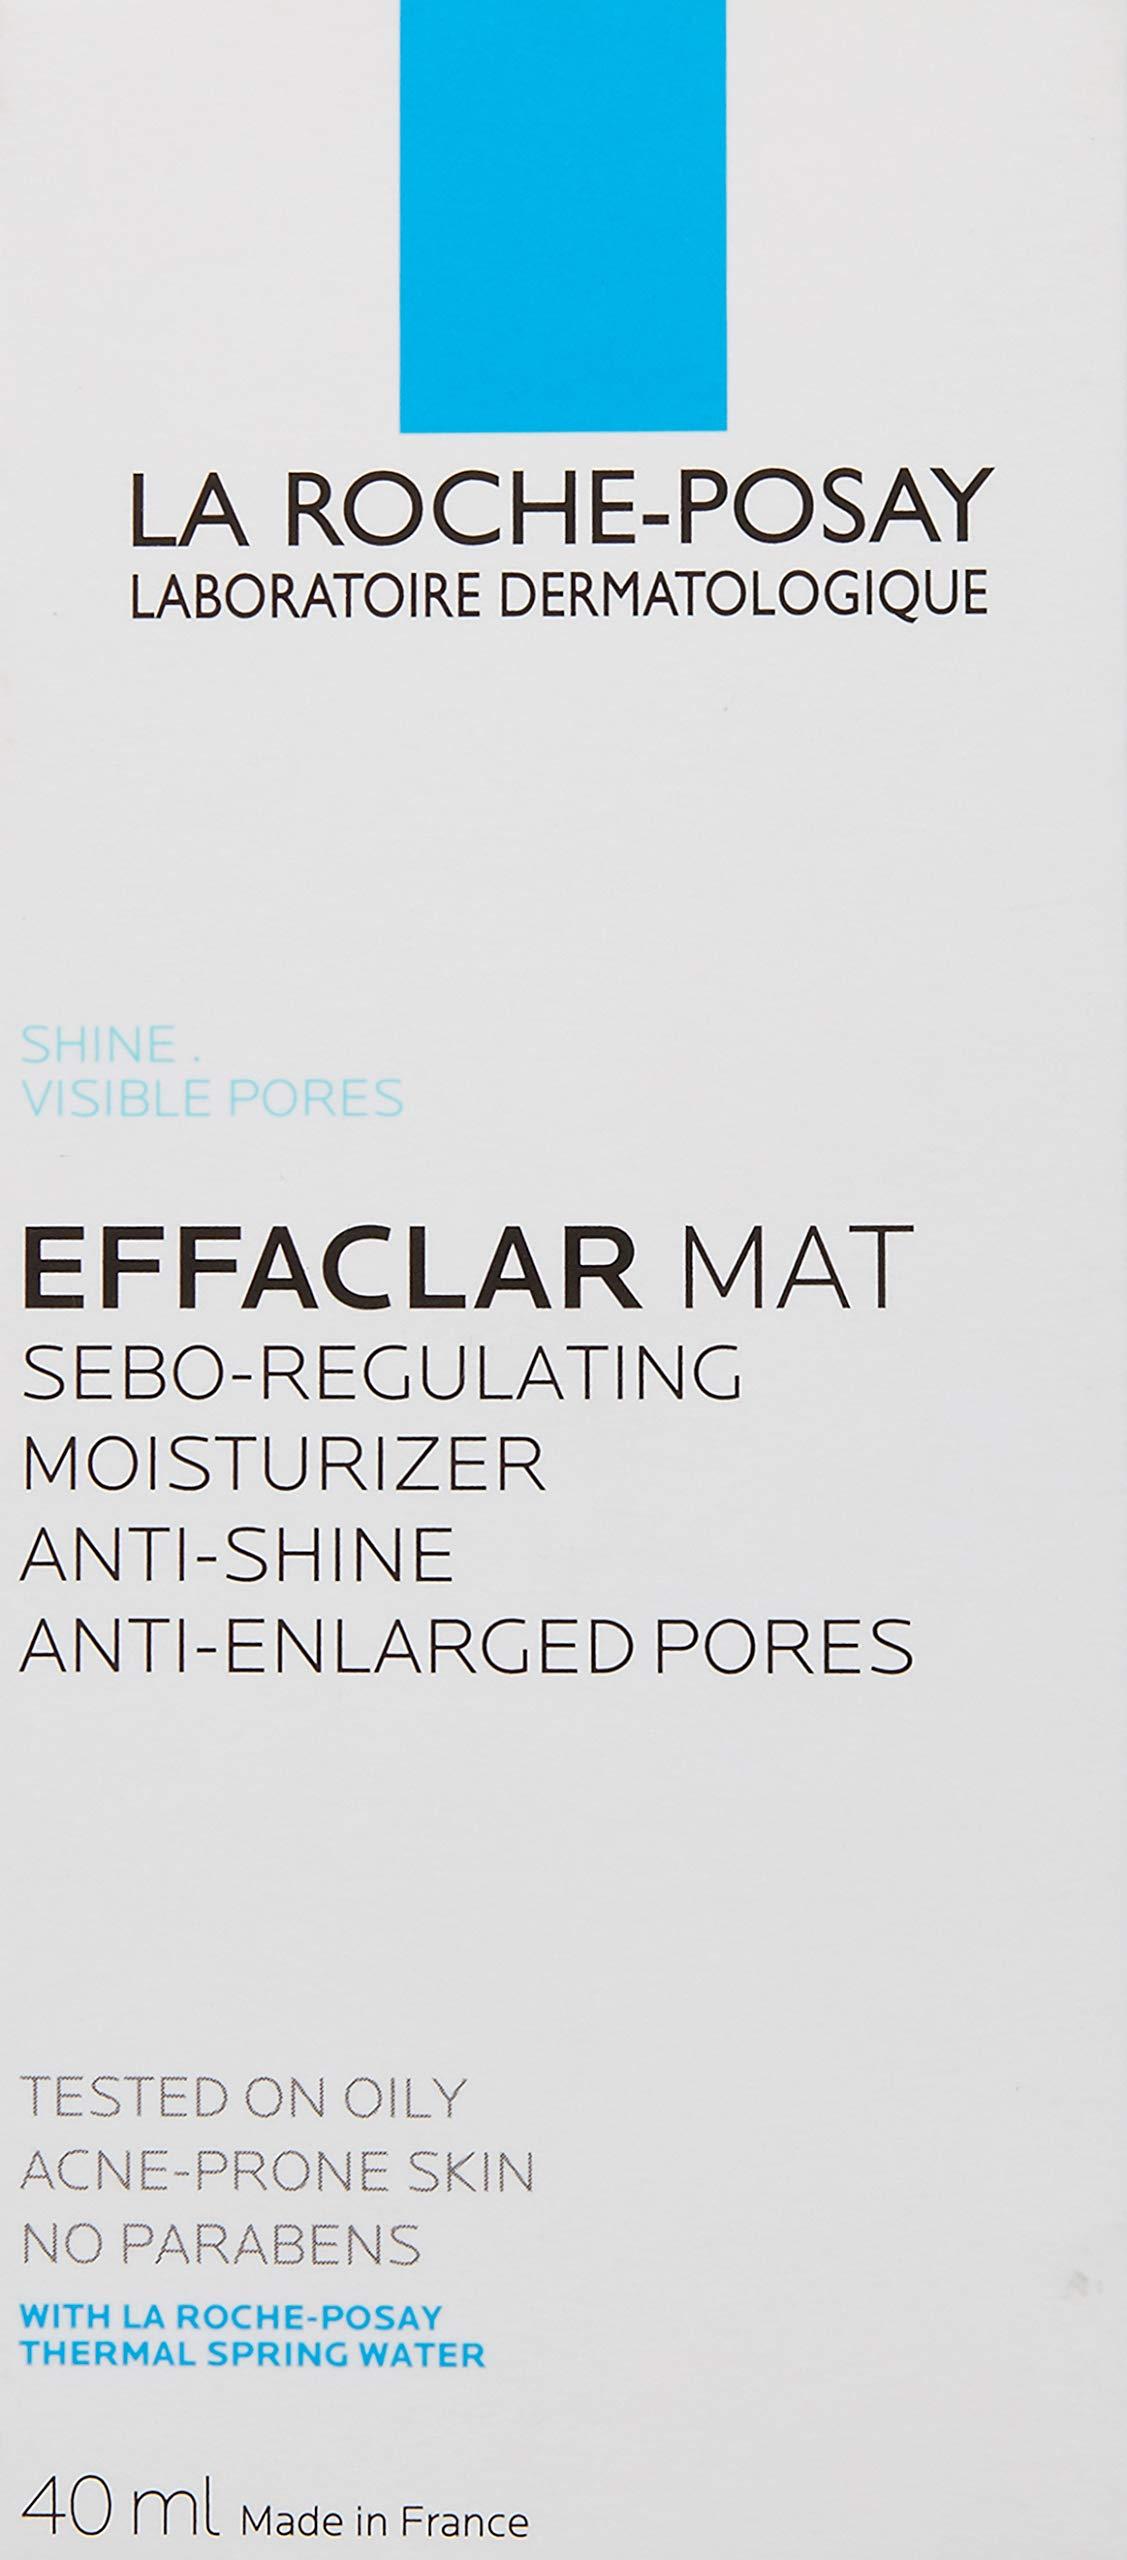 71d9Wo7MvFL - La Roche Possay EFFACLAR MAT 40ml